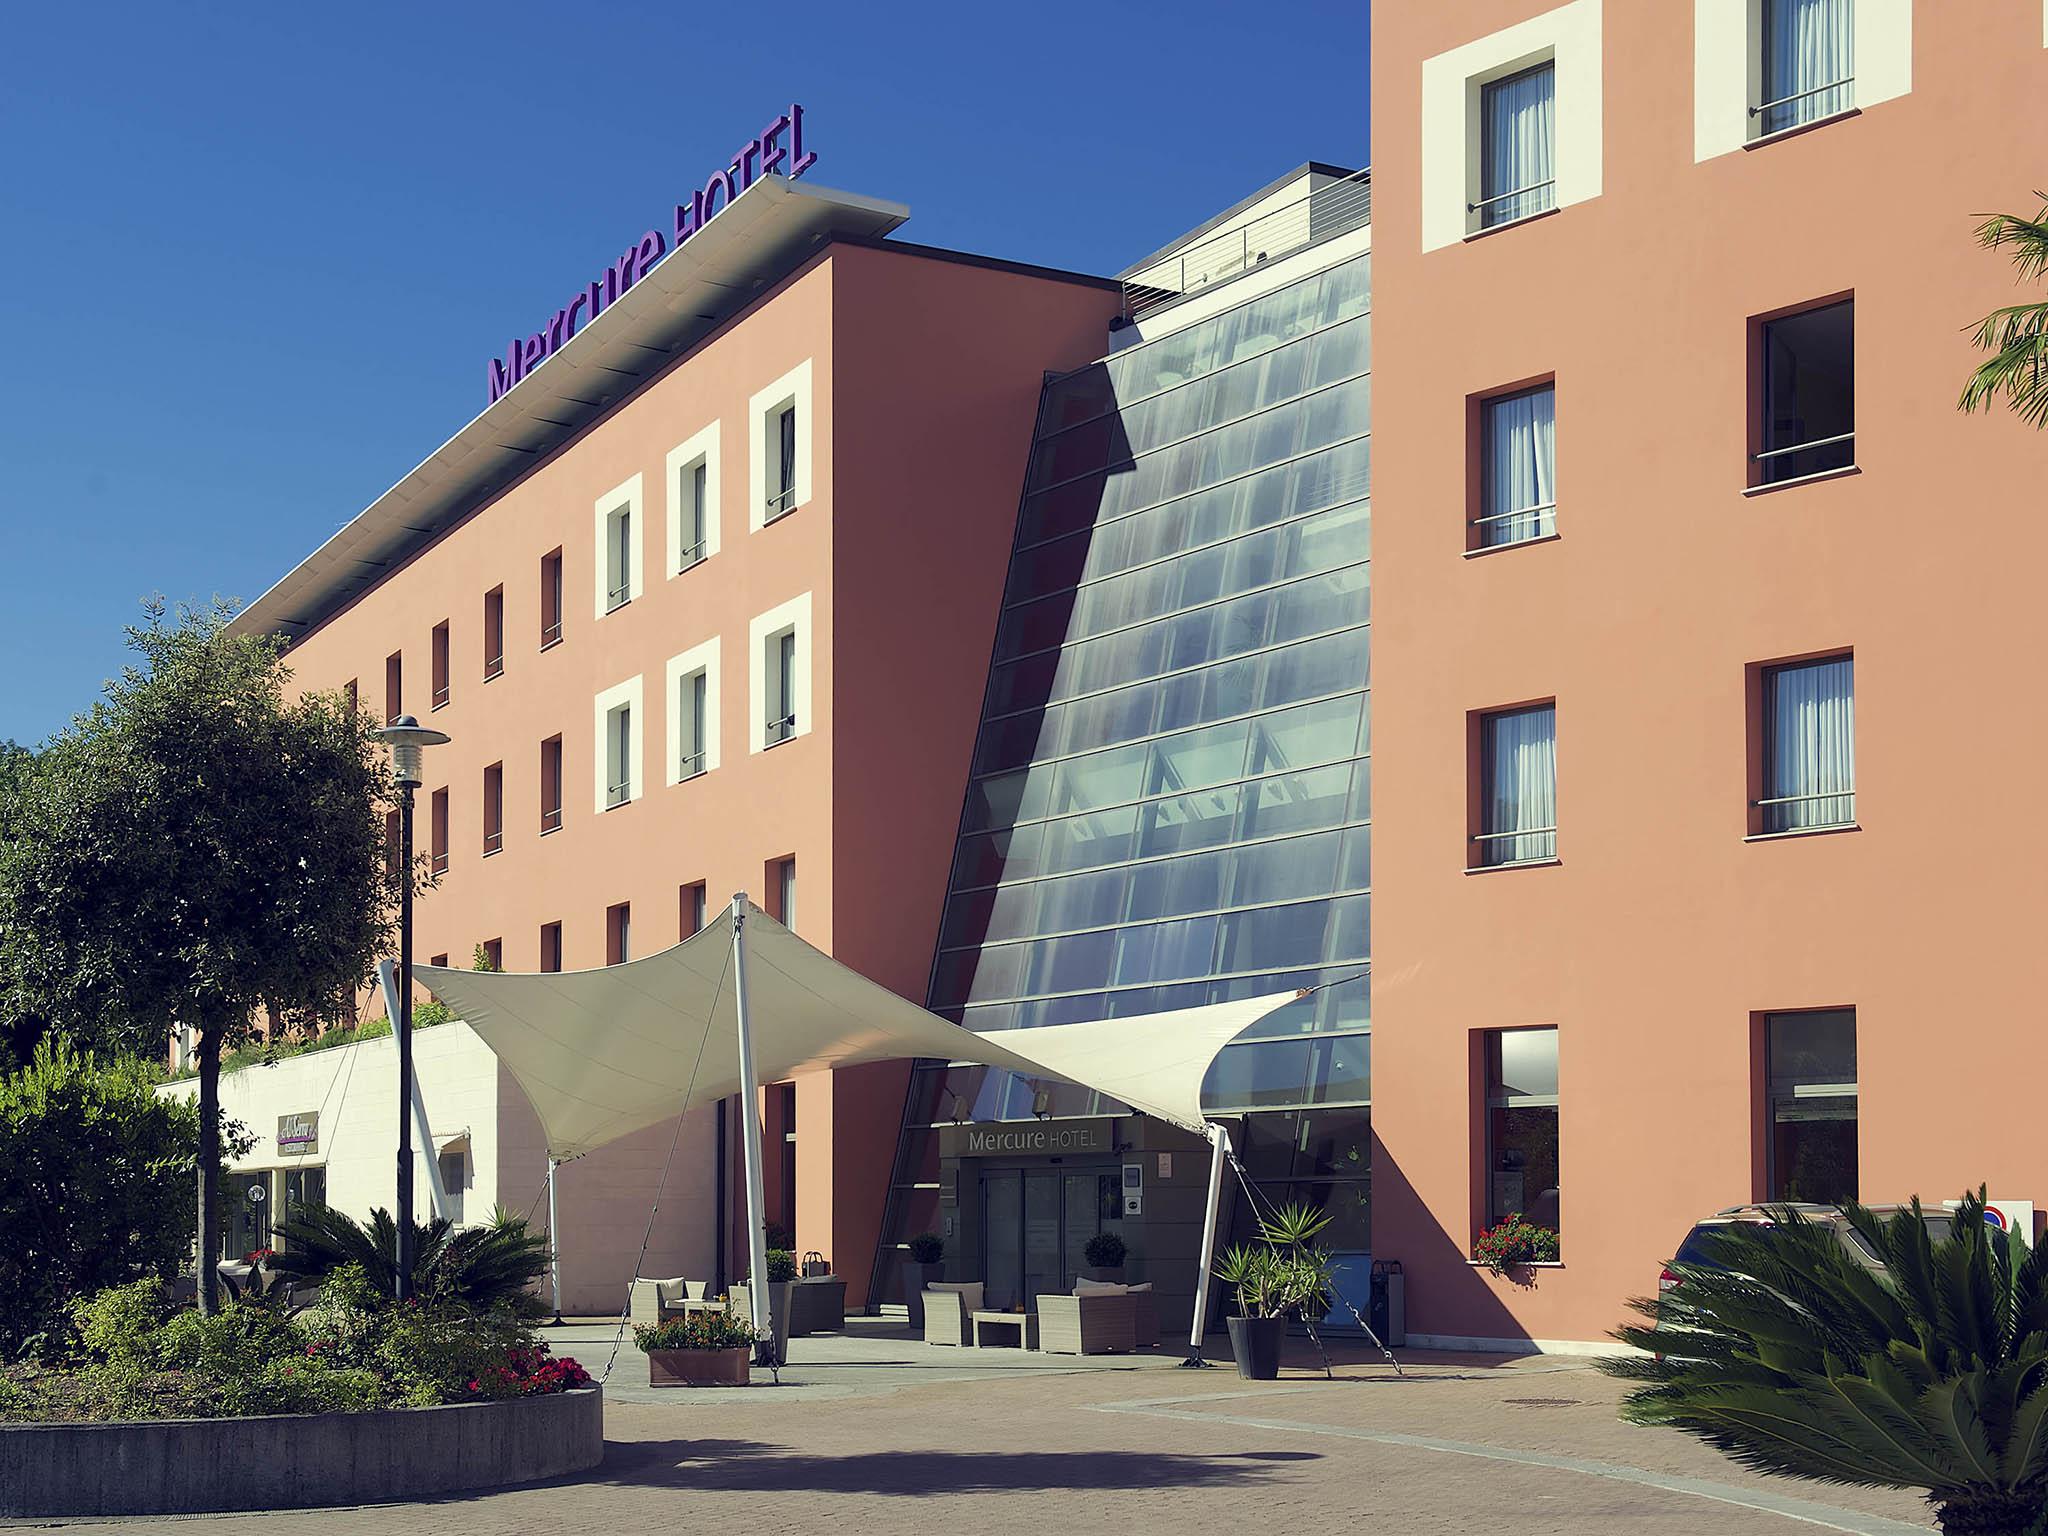 Mercure Genoa San Biagio hotel